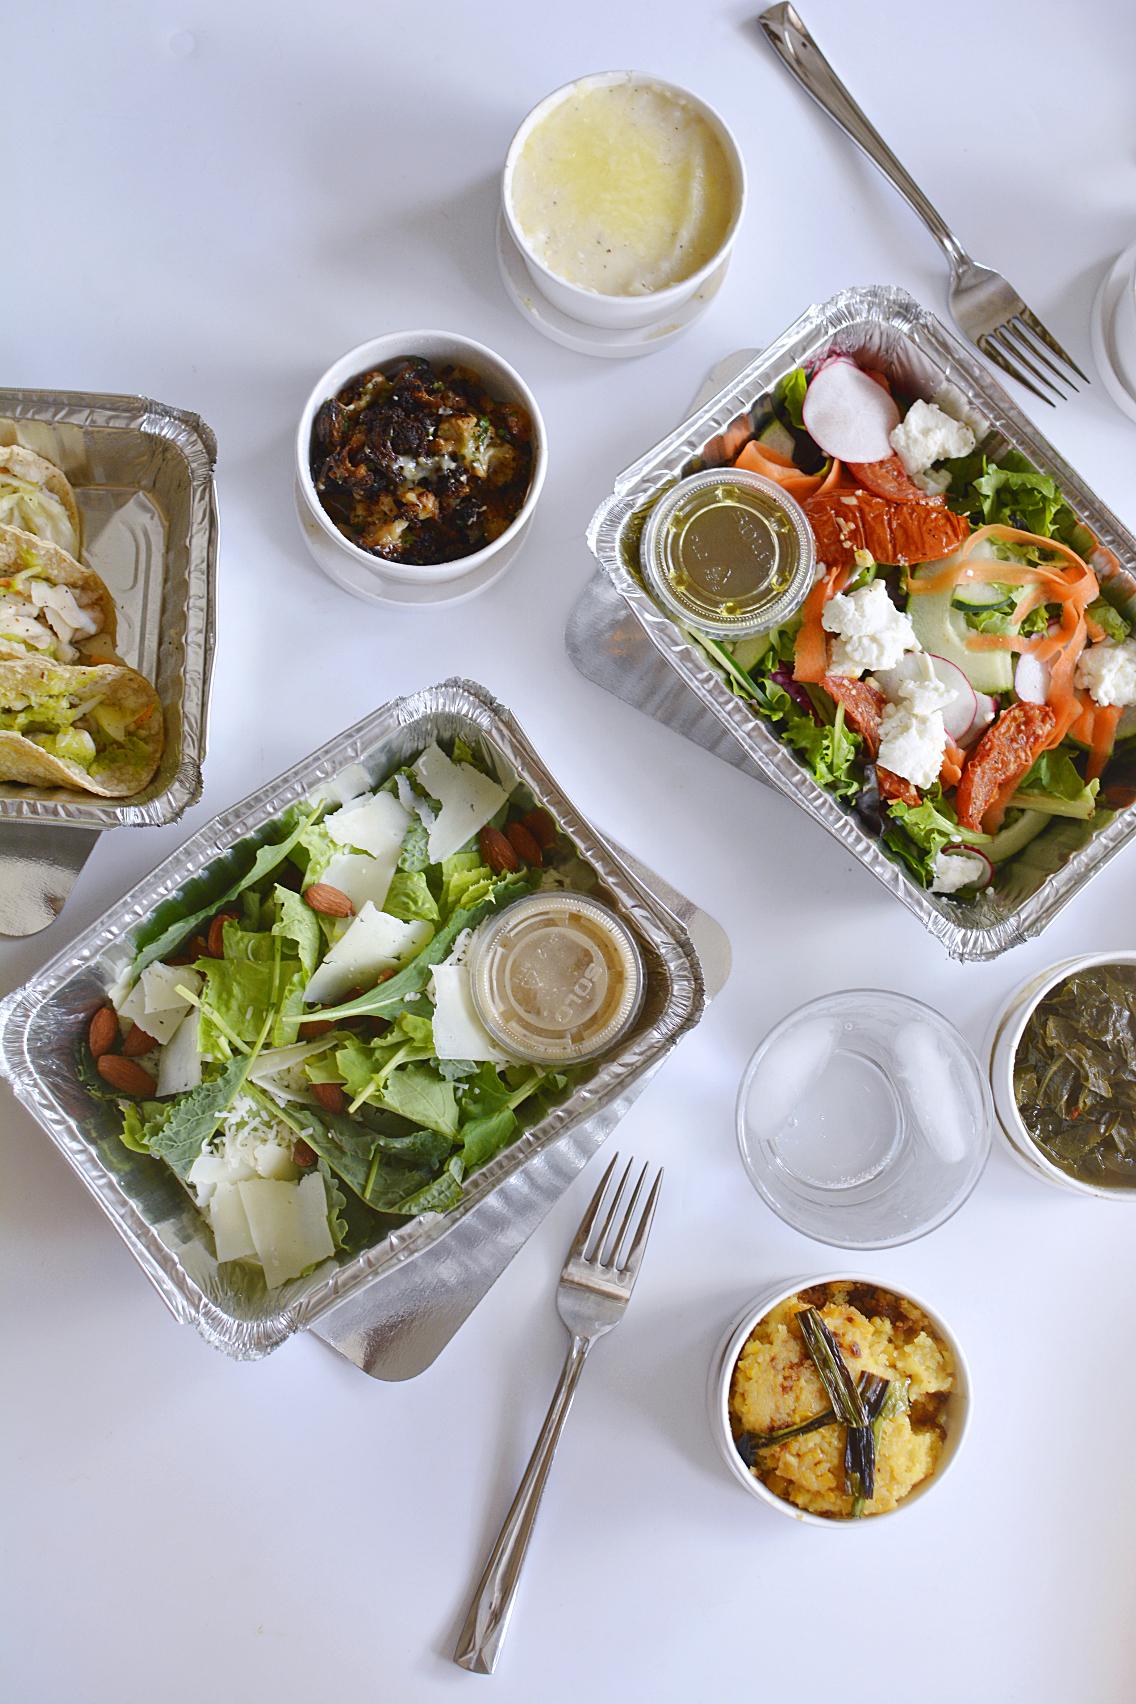 County BBQ DMK Kale and Romaine Caesar Salad Field Greens